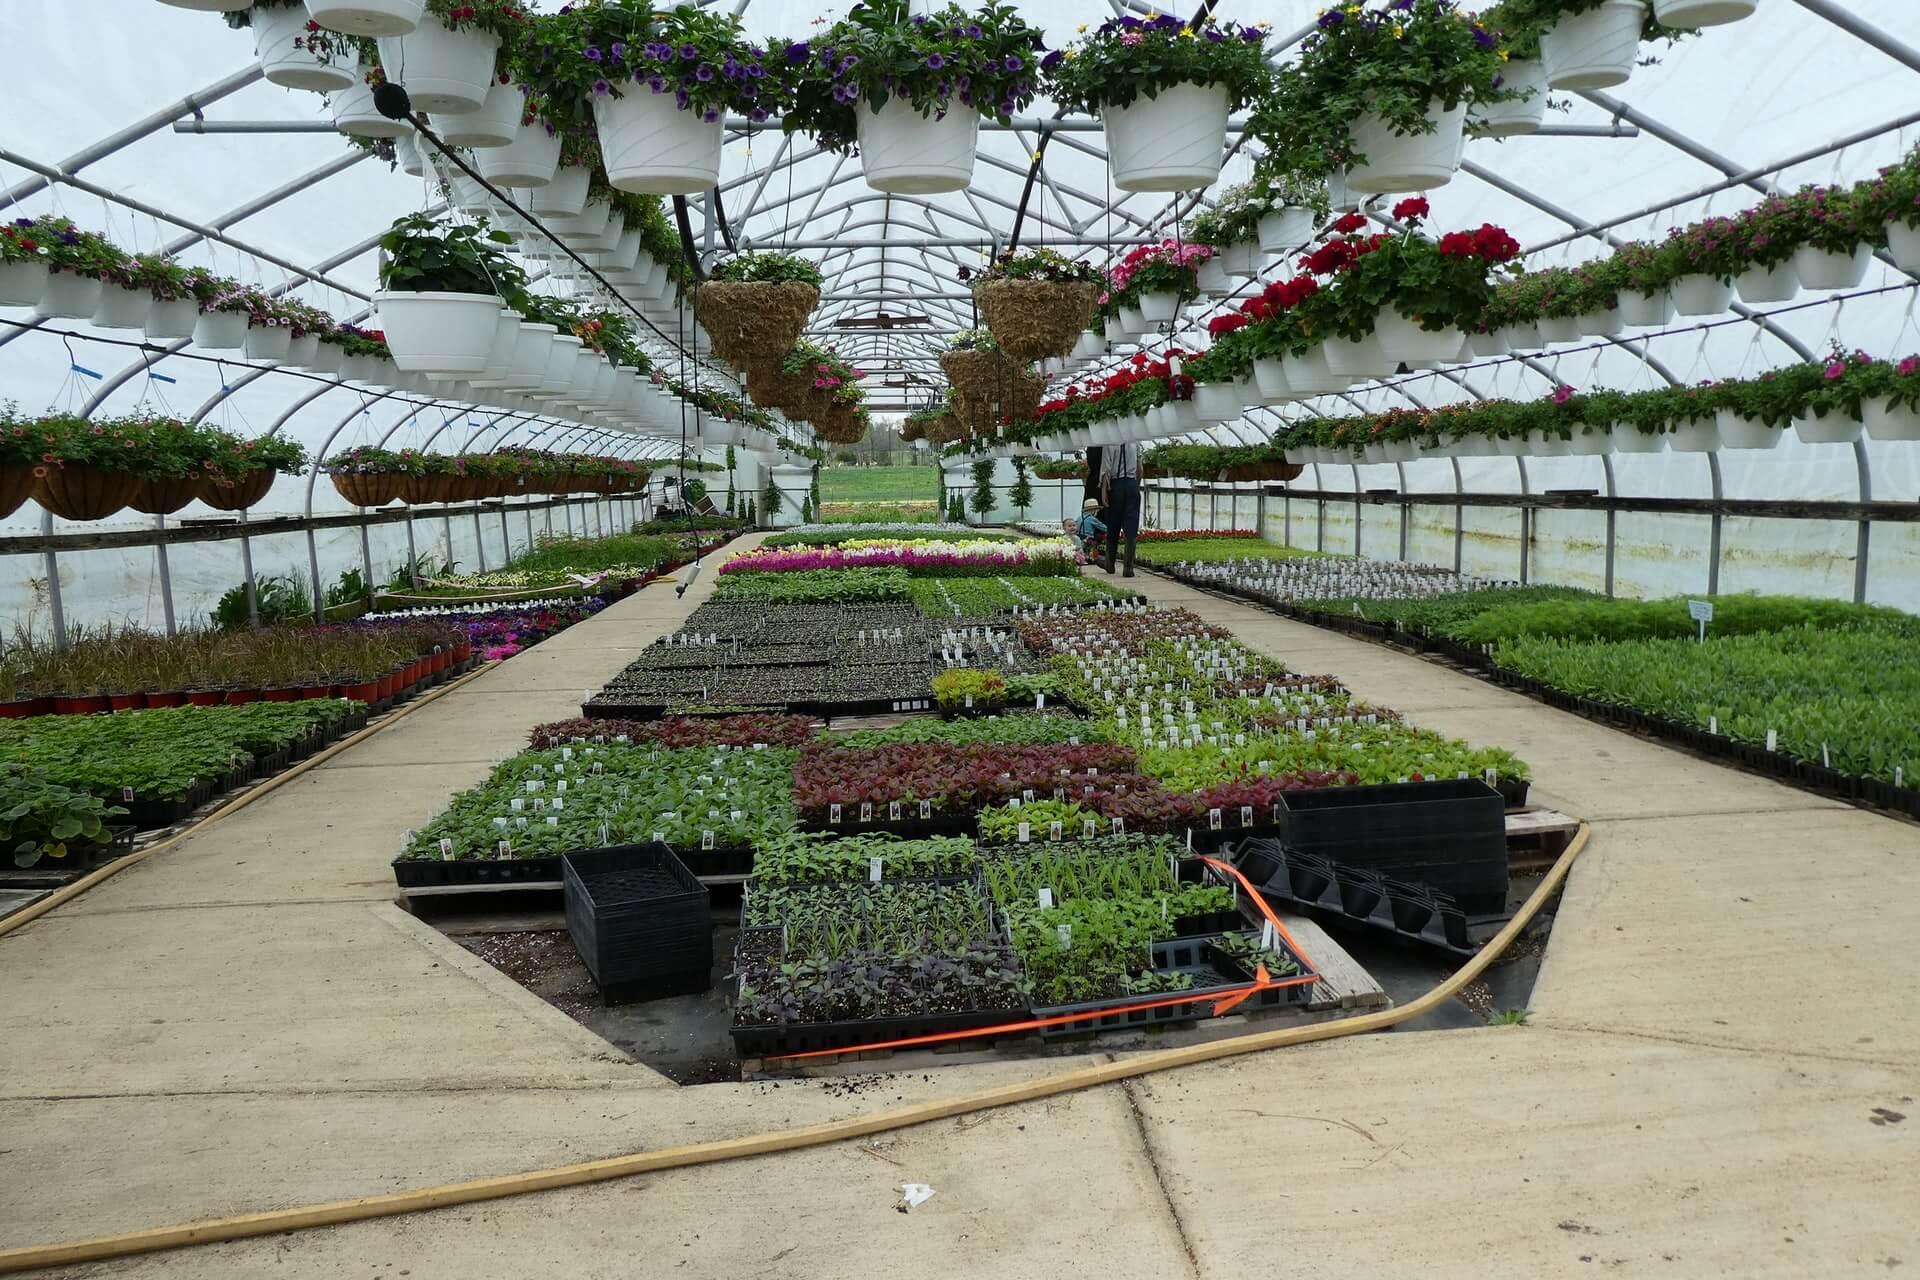 greenhouse-testimonial-header-background